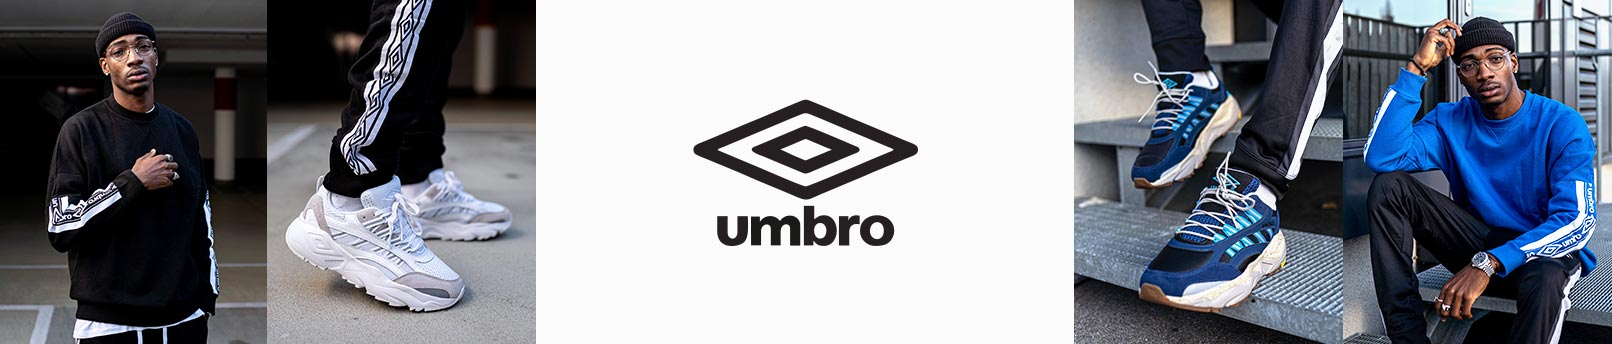 Shop Umbro